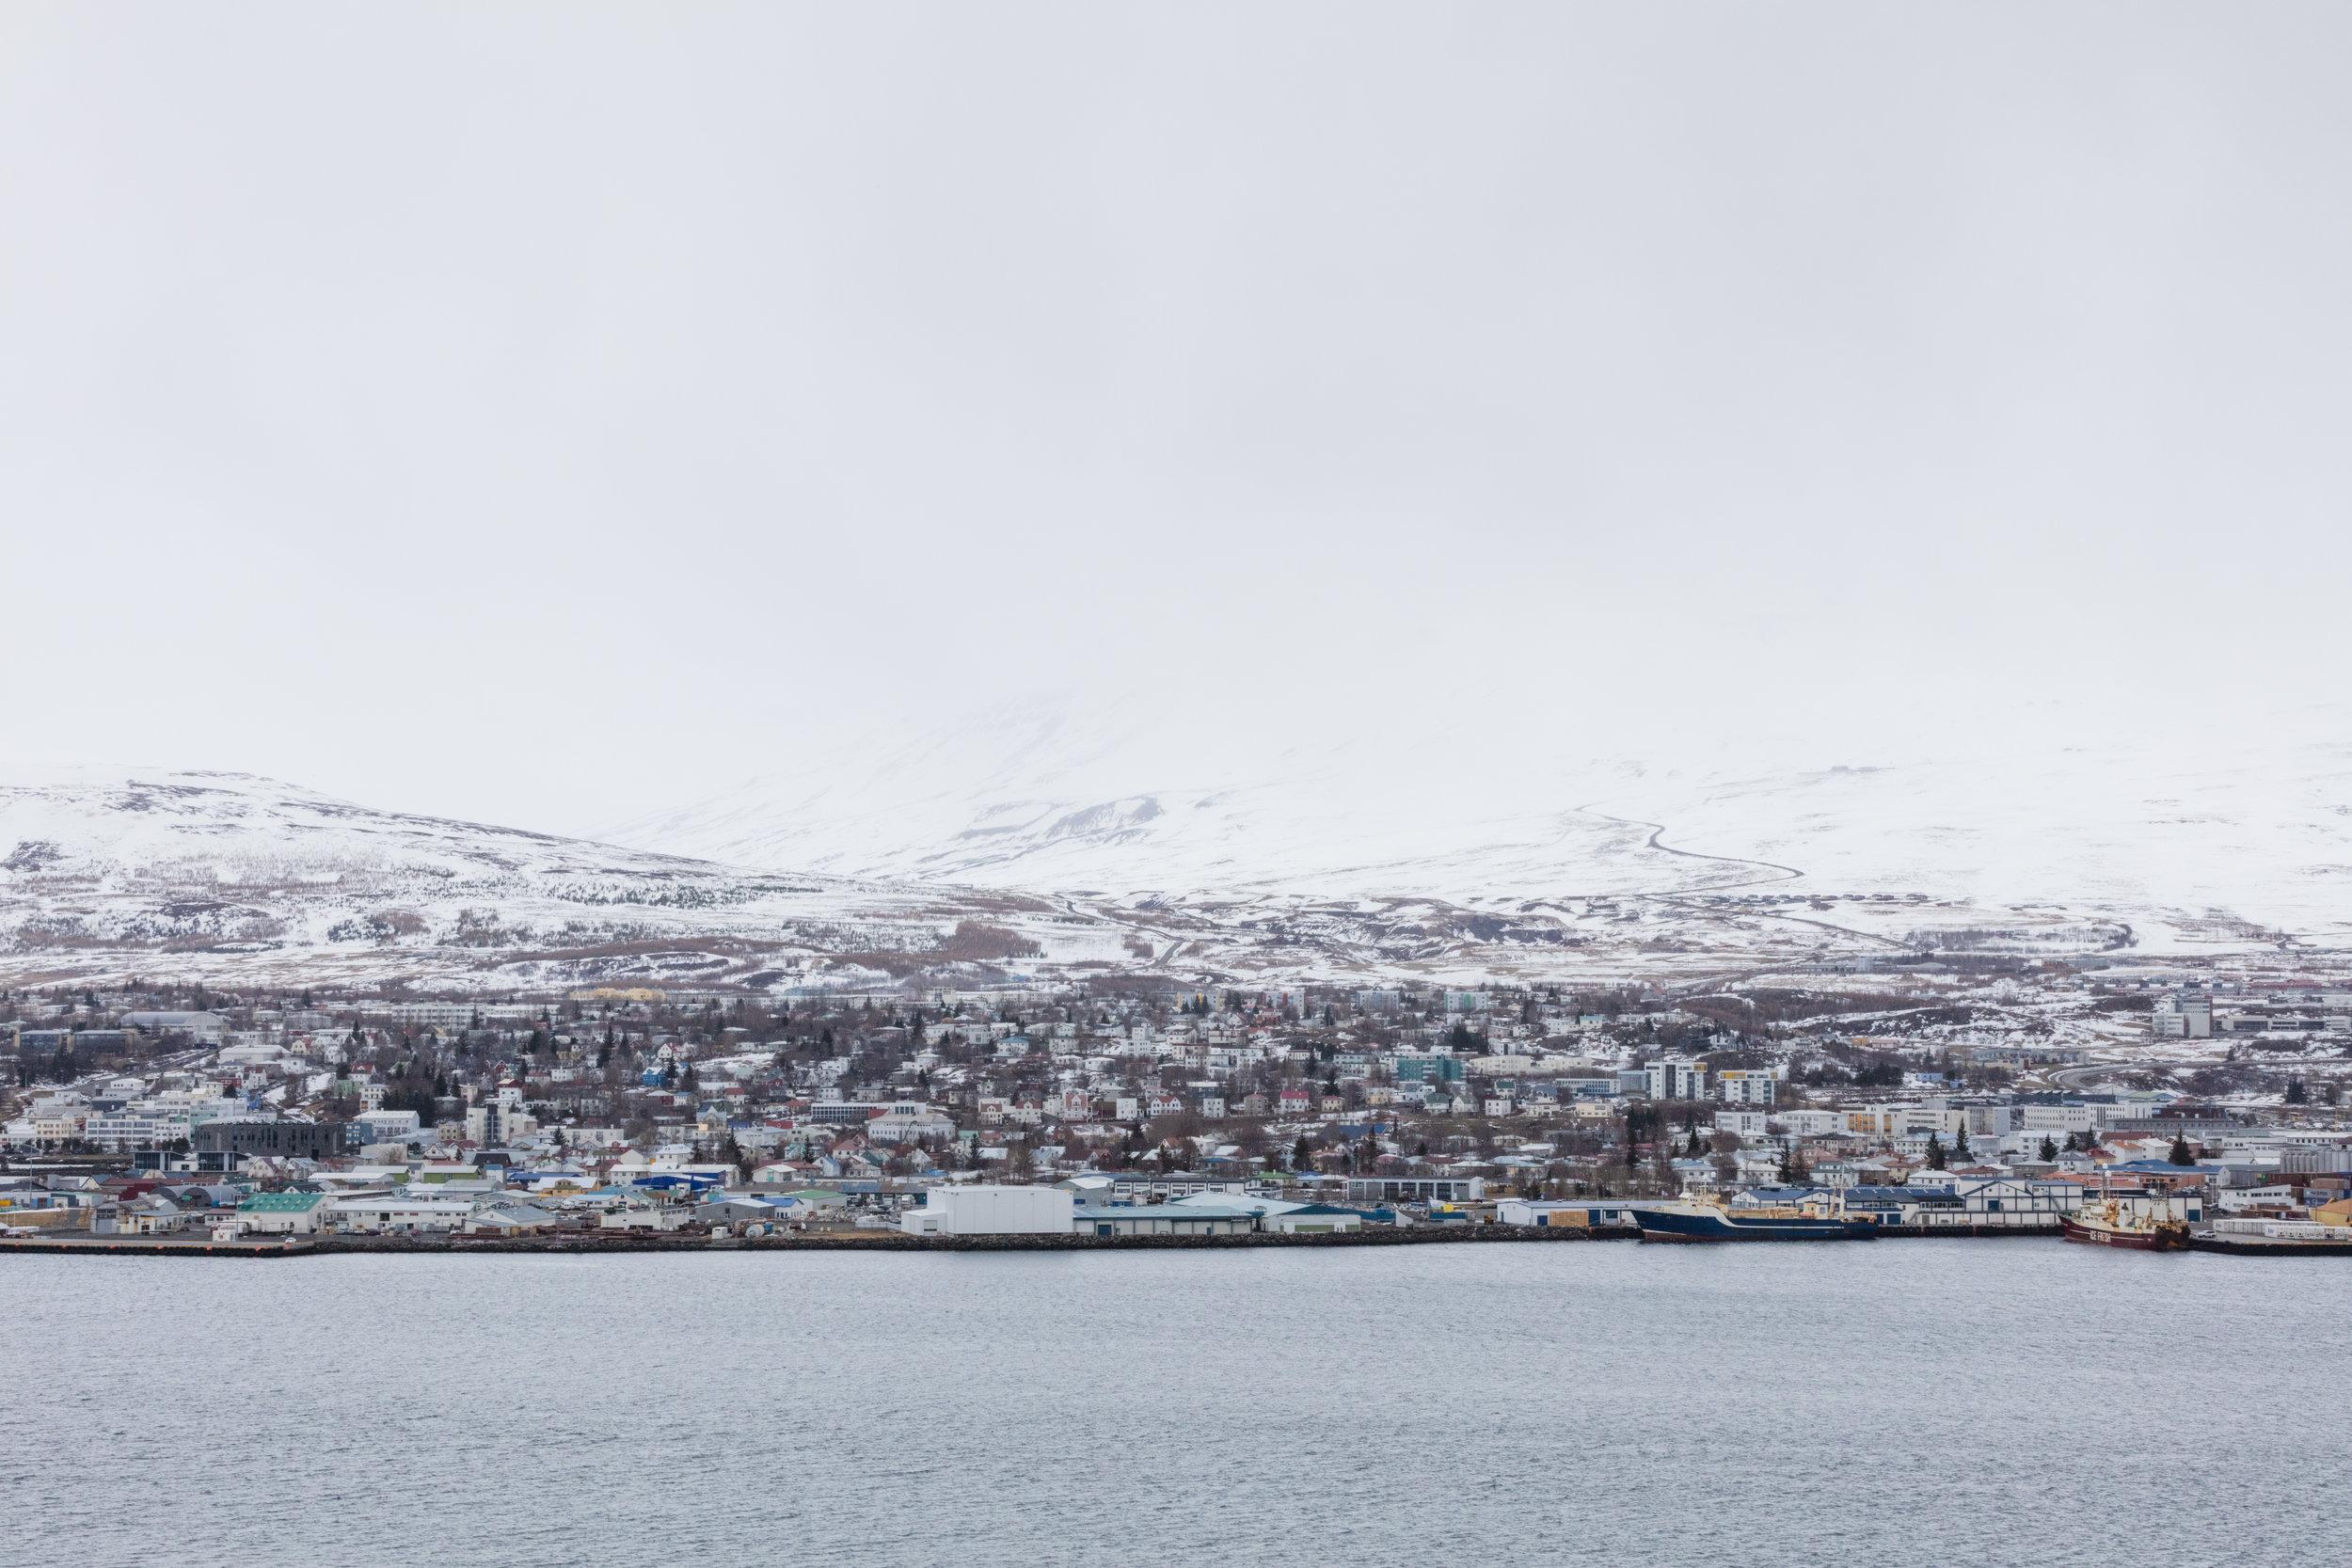 Akureyri+|+Landscapes+North+Iceland+-+Faune.jpg